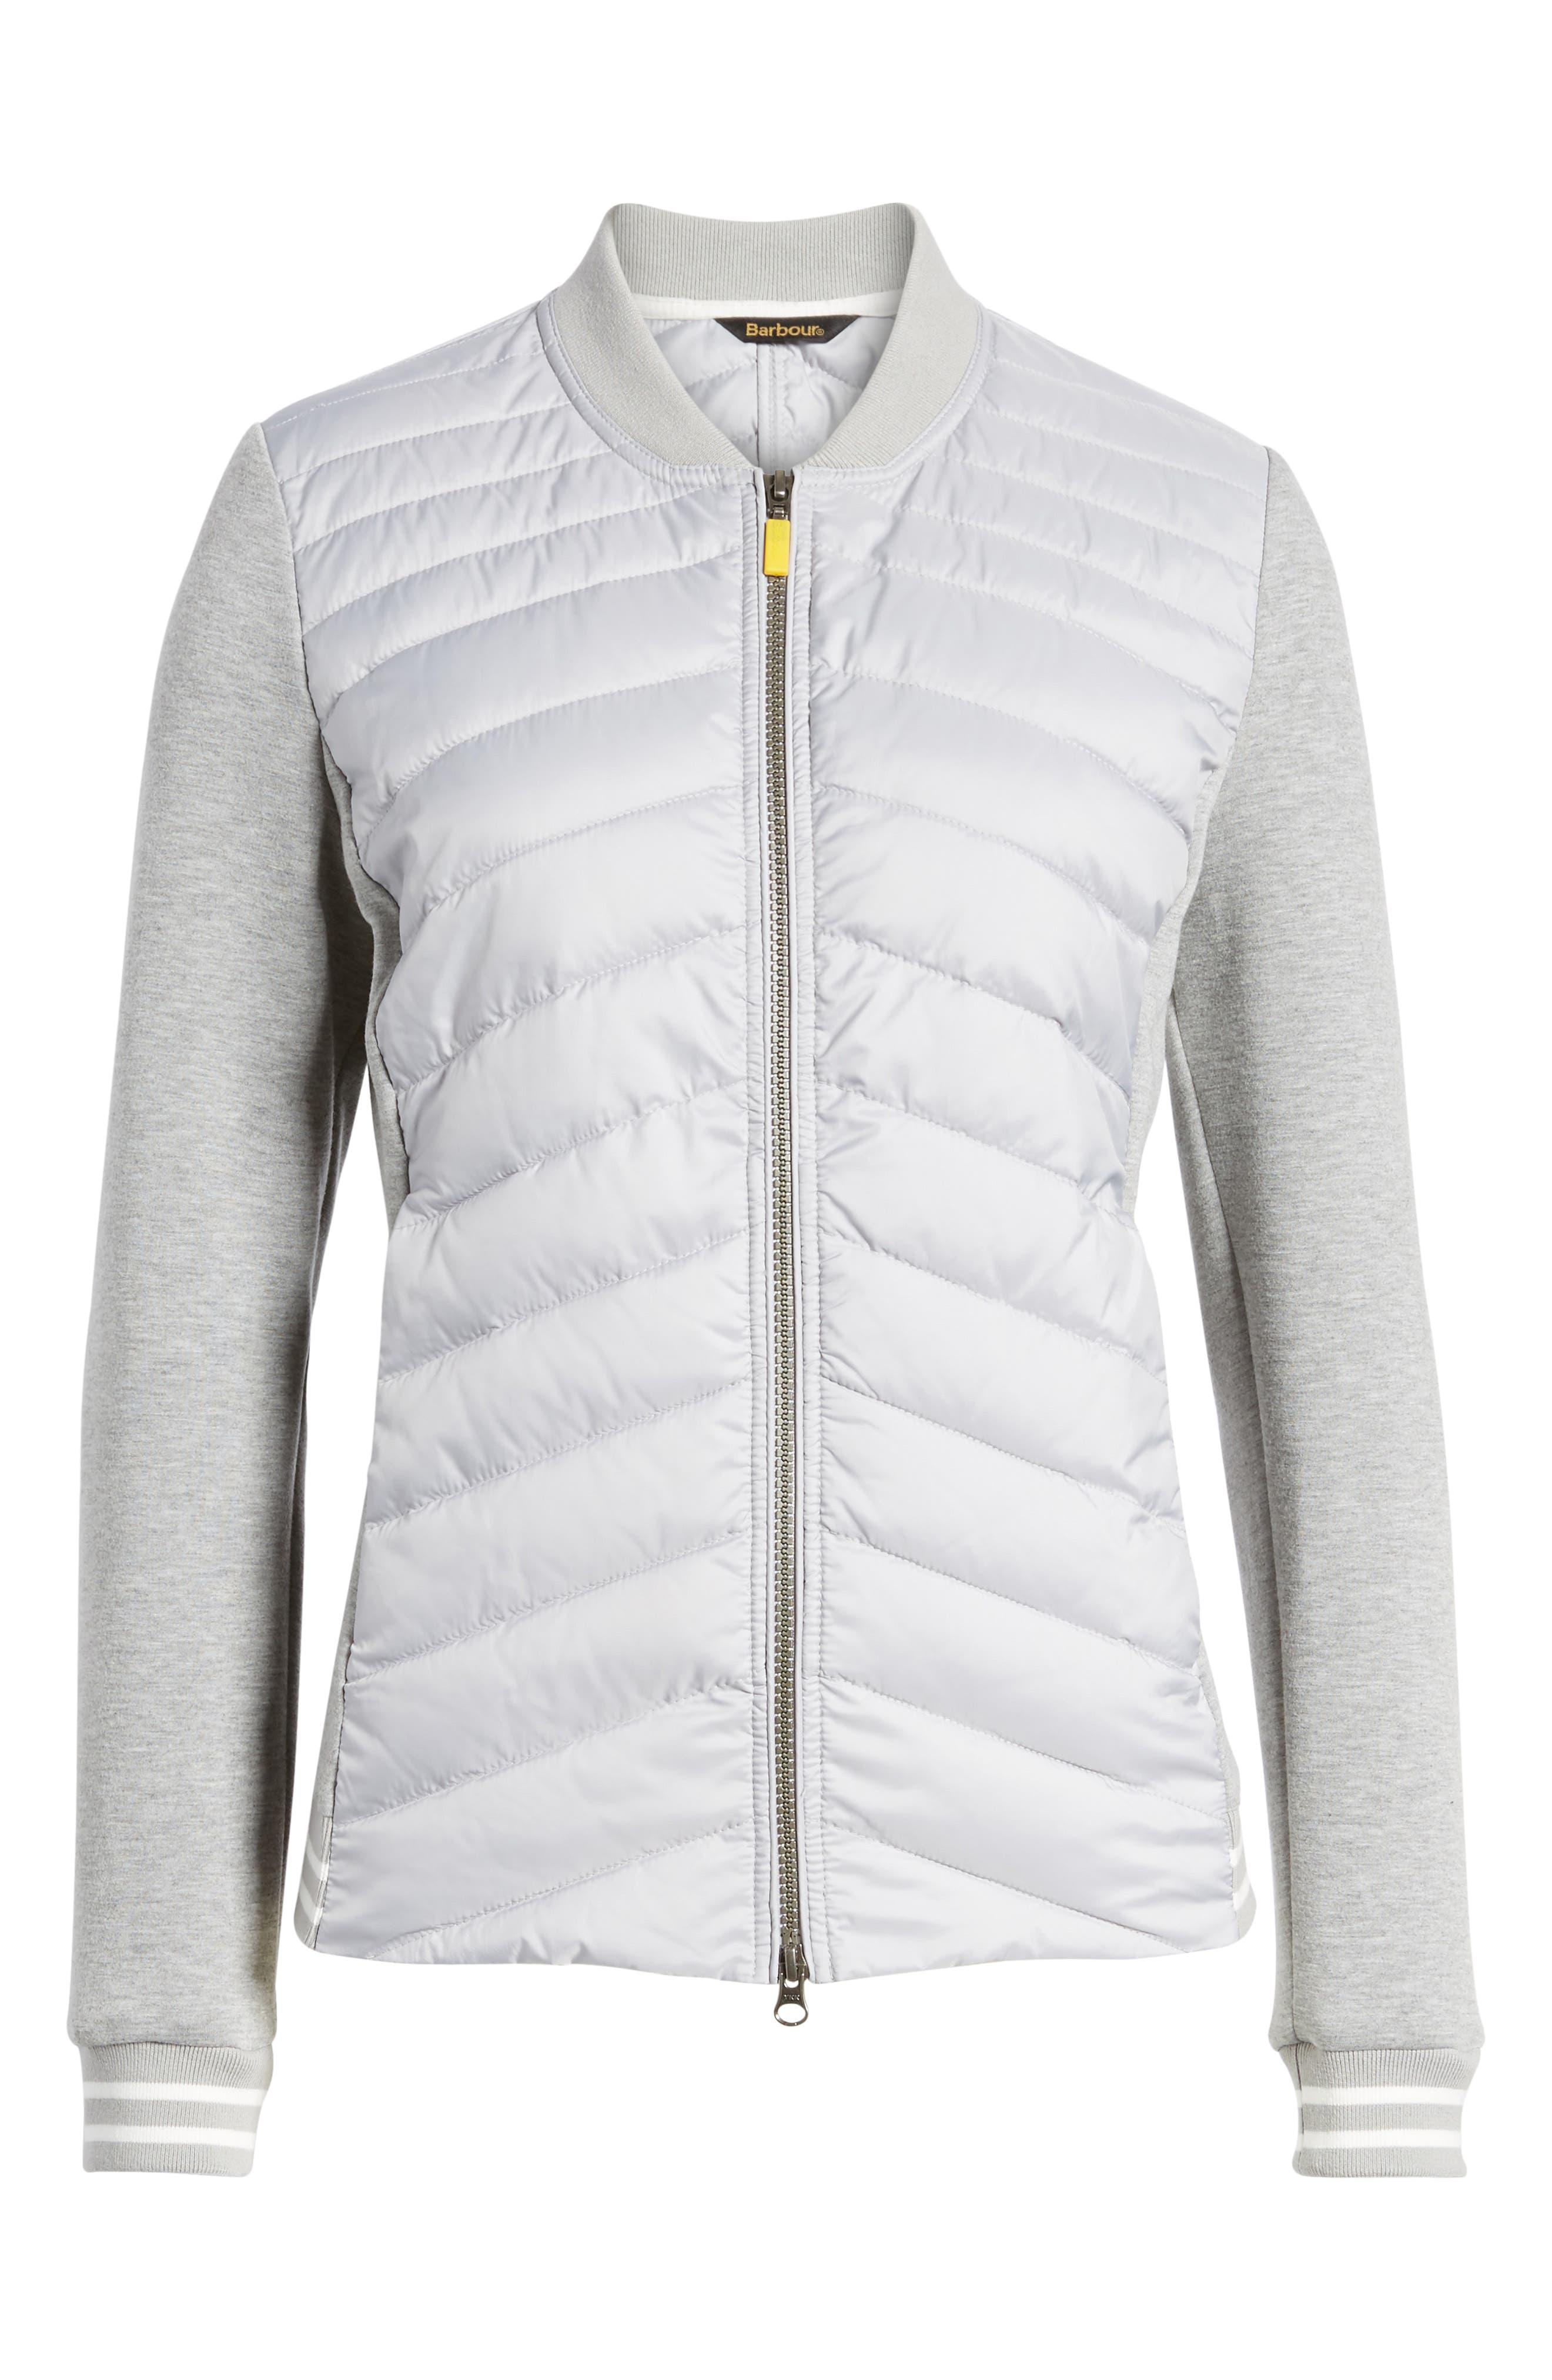 Pembrey Sweatshirt Jacket,                             Alternate thumbnail 6, color,                             Ice White